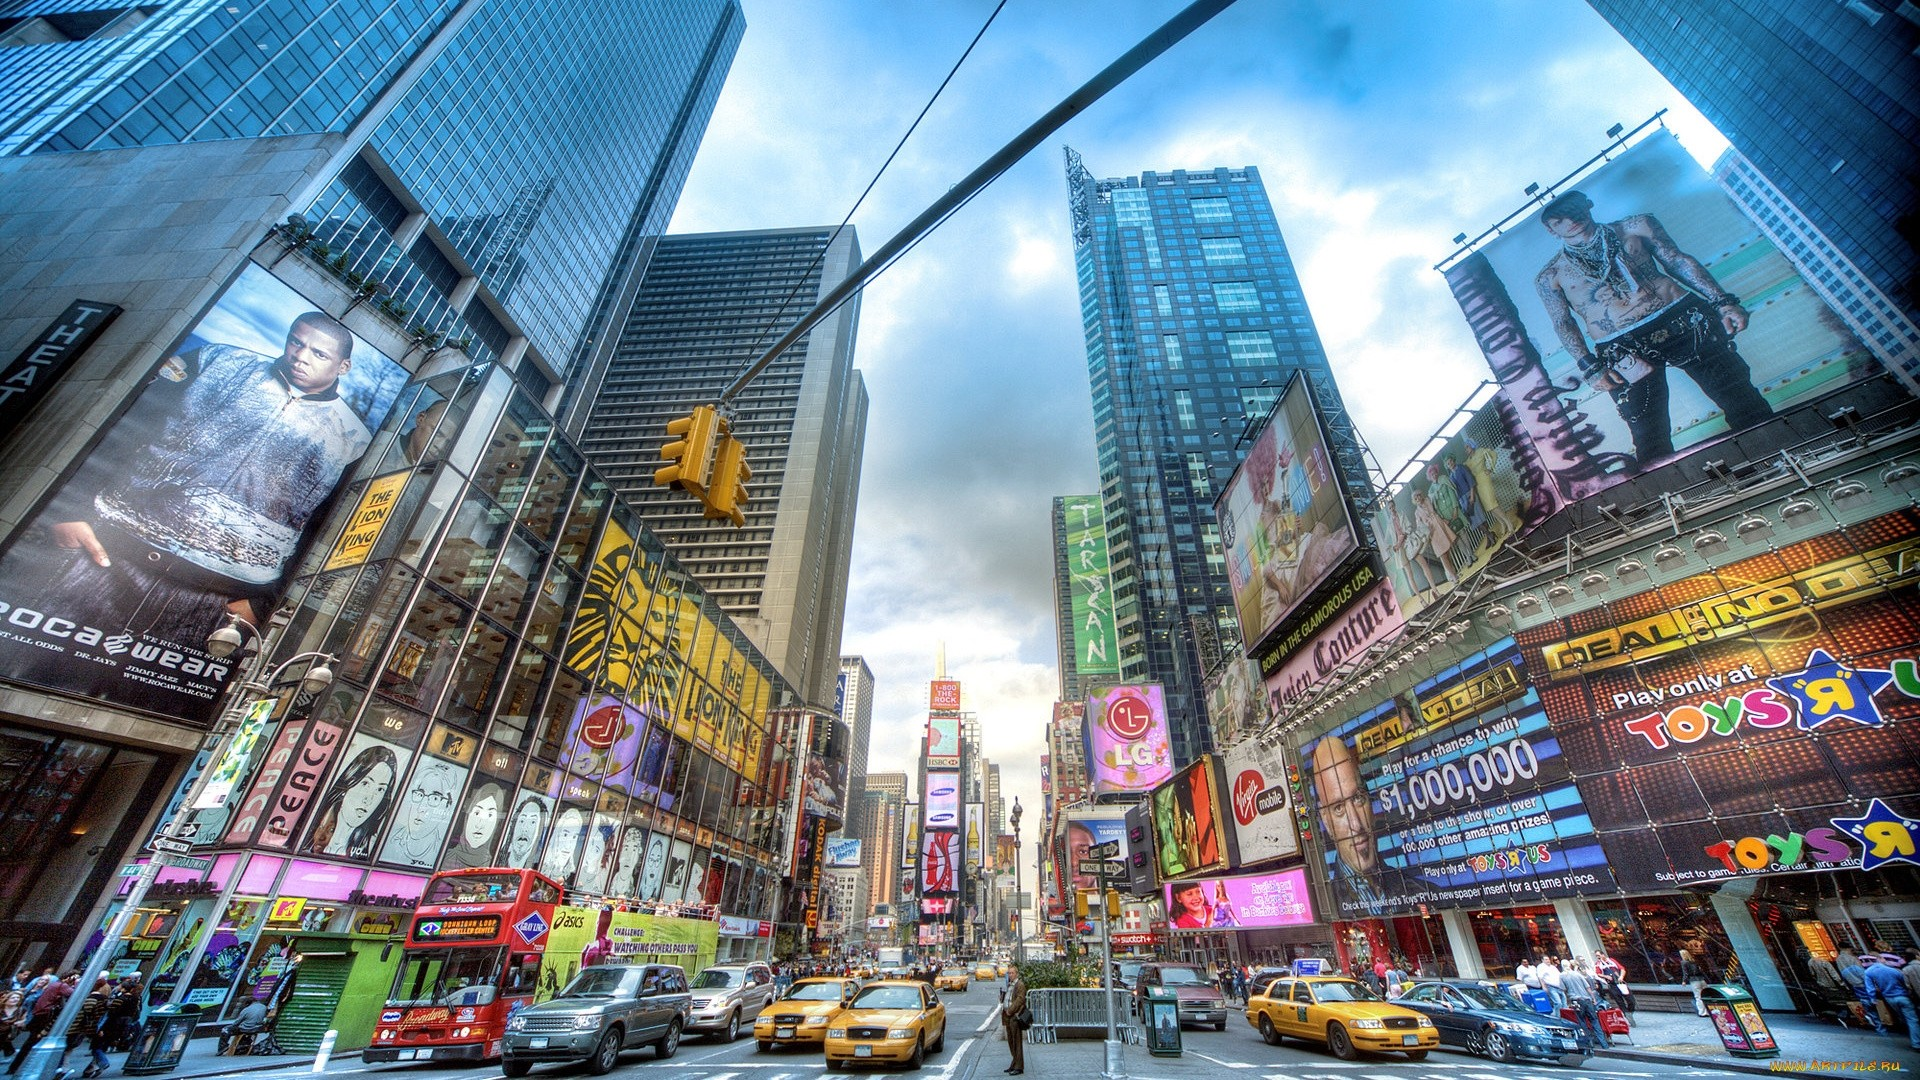 New York Street hd desktop wallpaper